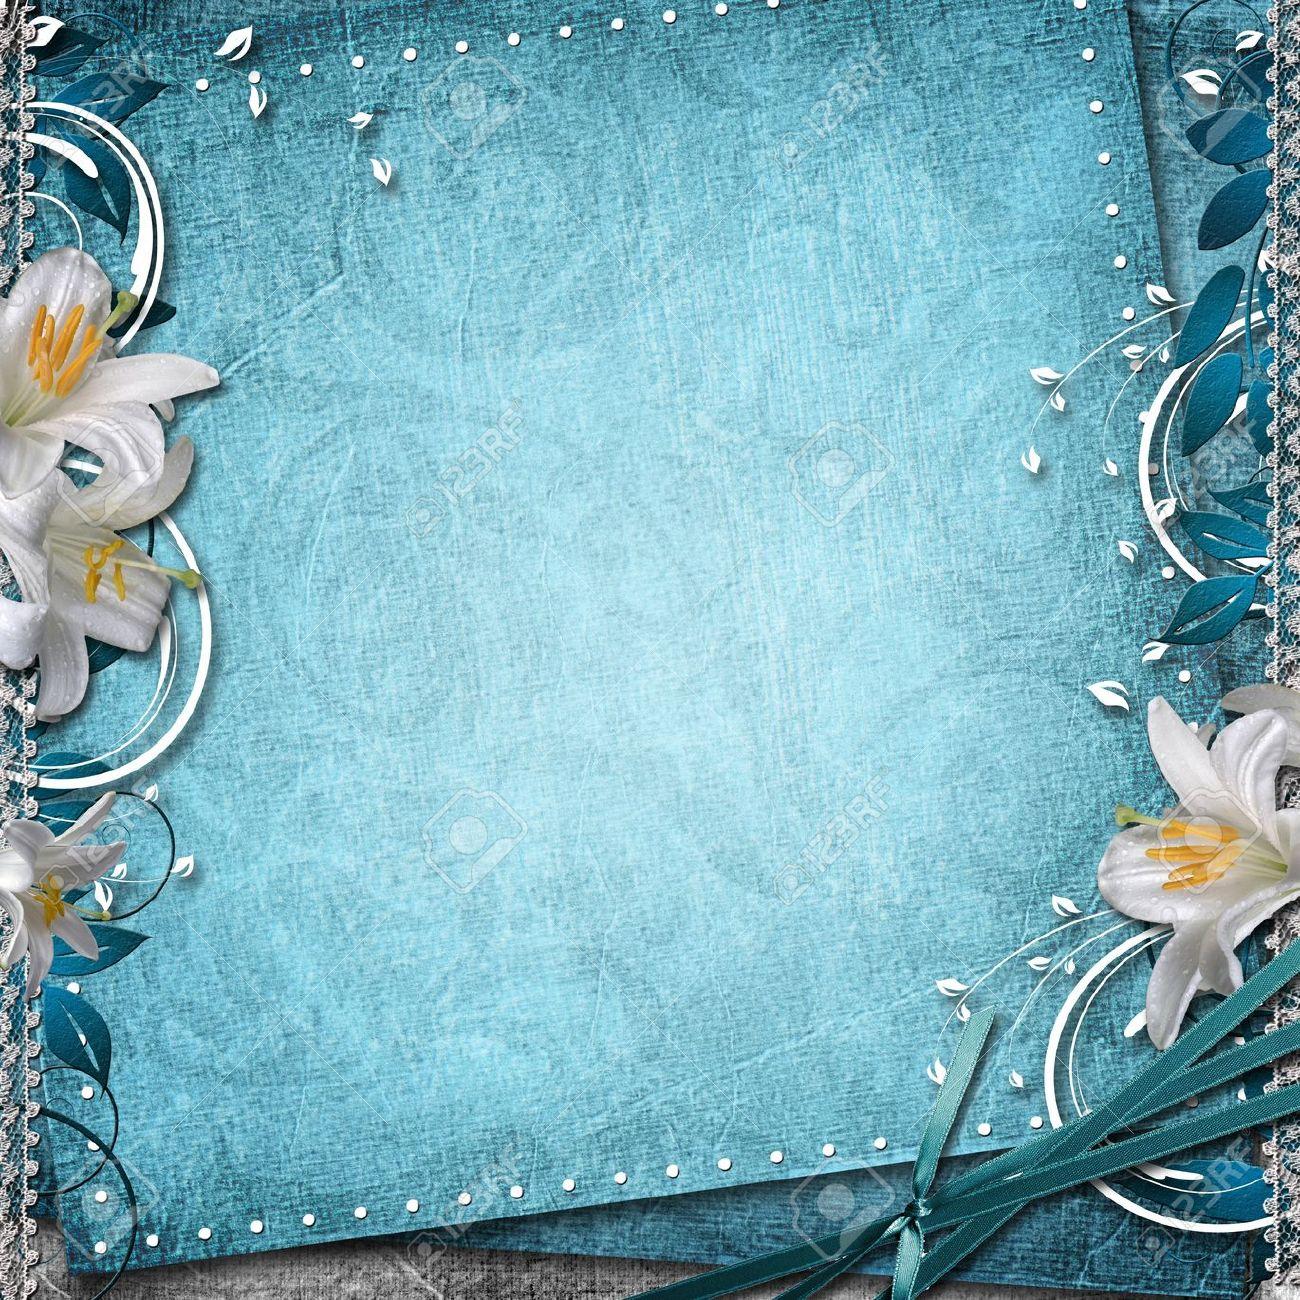 Blue wedding background design hd clipartsgram com -  Wedding Invitation Background Wallpaperwedding Invitation Sample Pics Photoswedding Backgrounds Blue